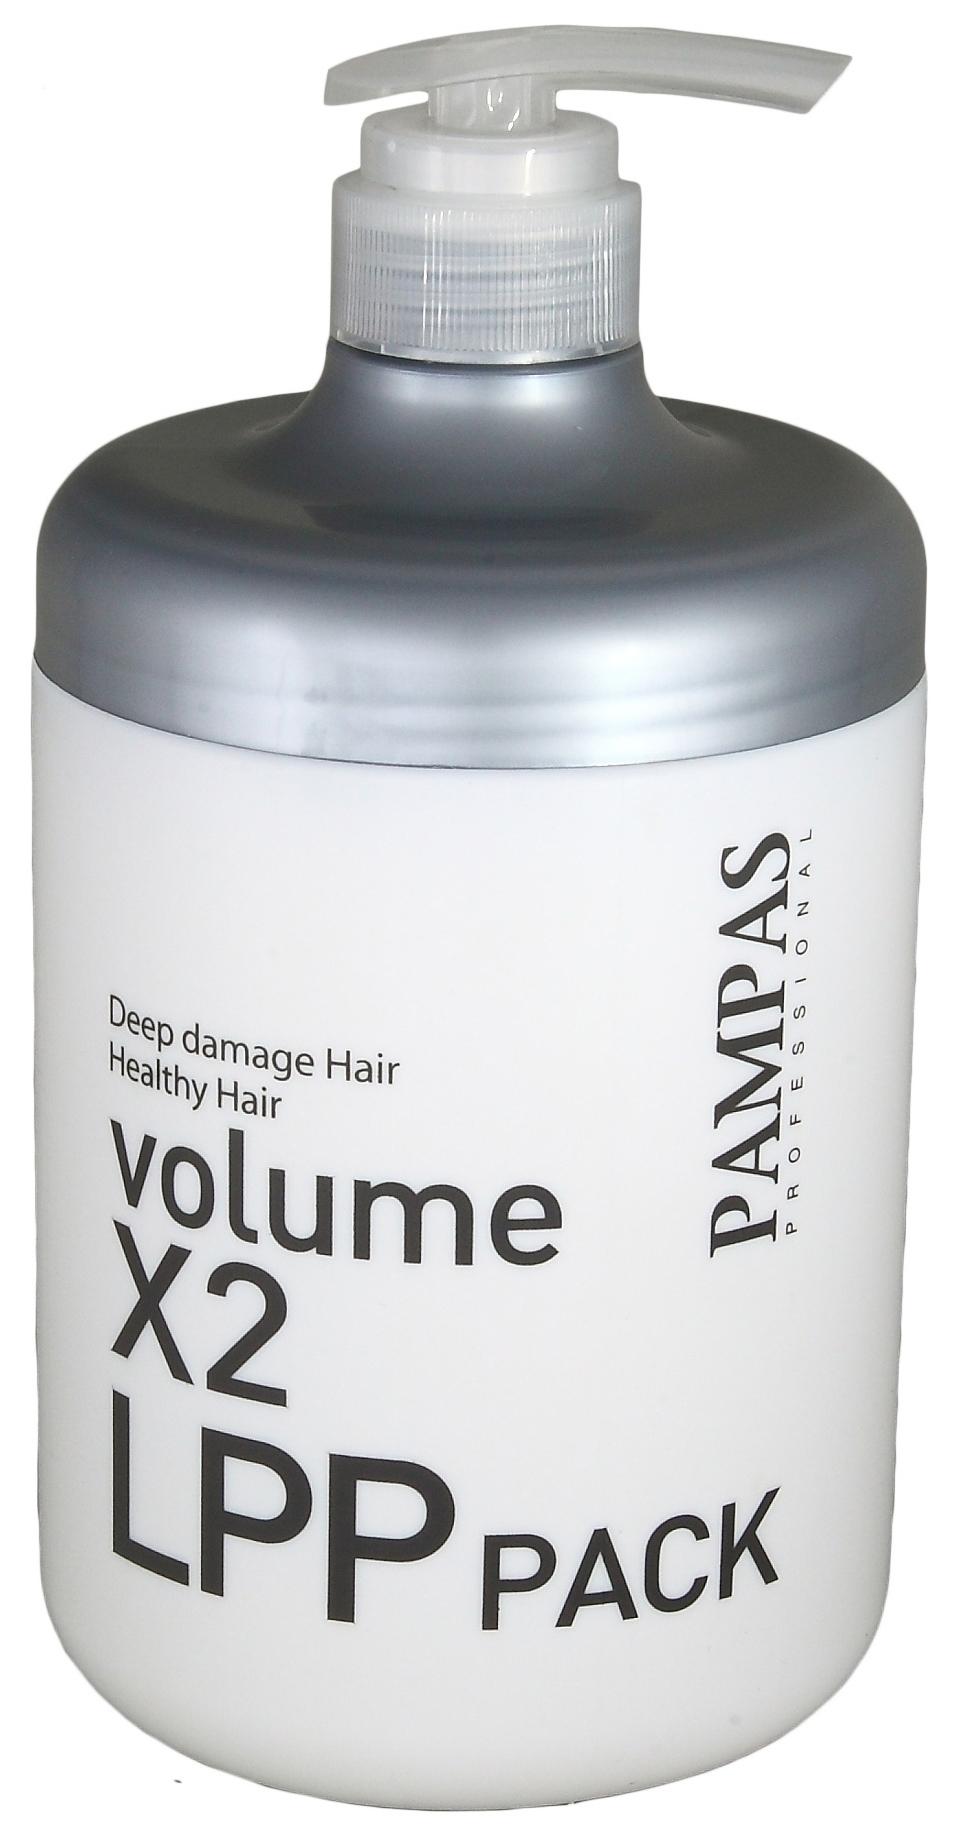 PAMPAS VOLUME X2 LPP HAIR PACK